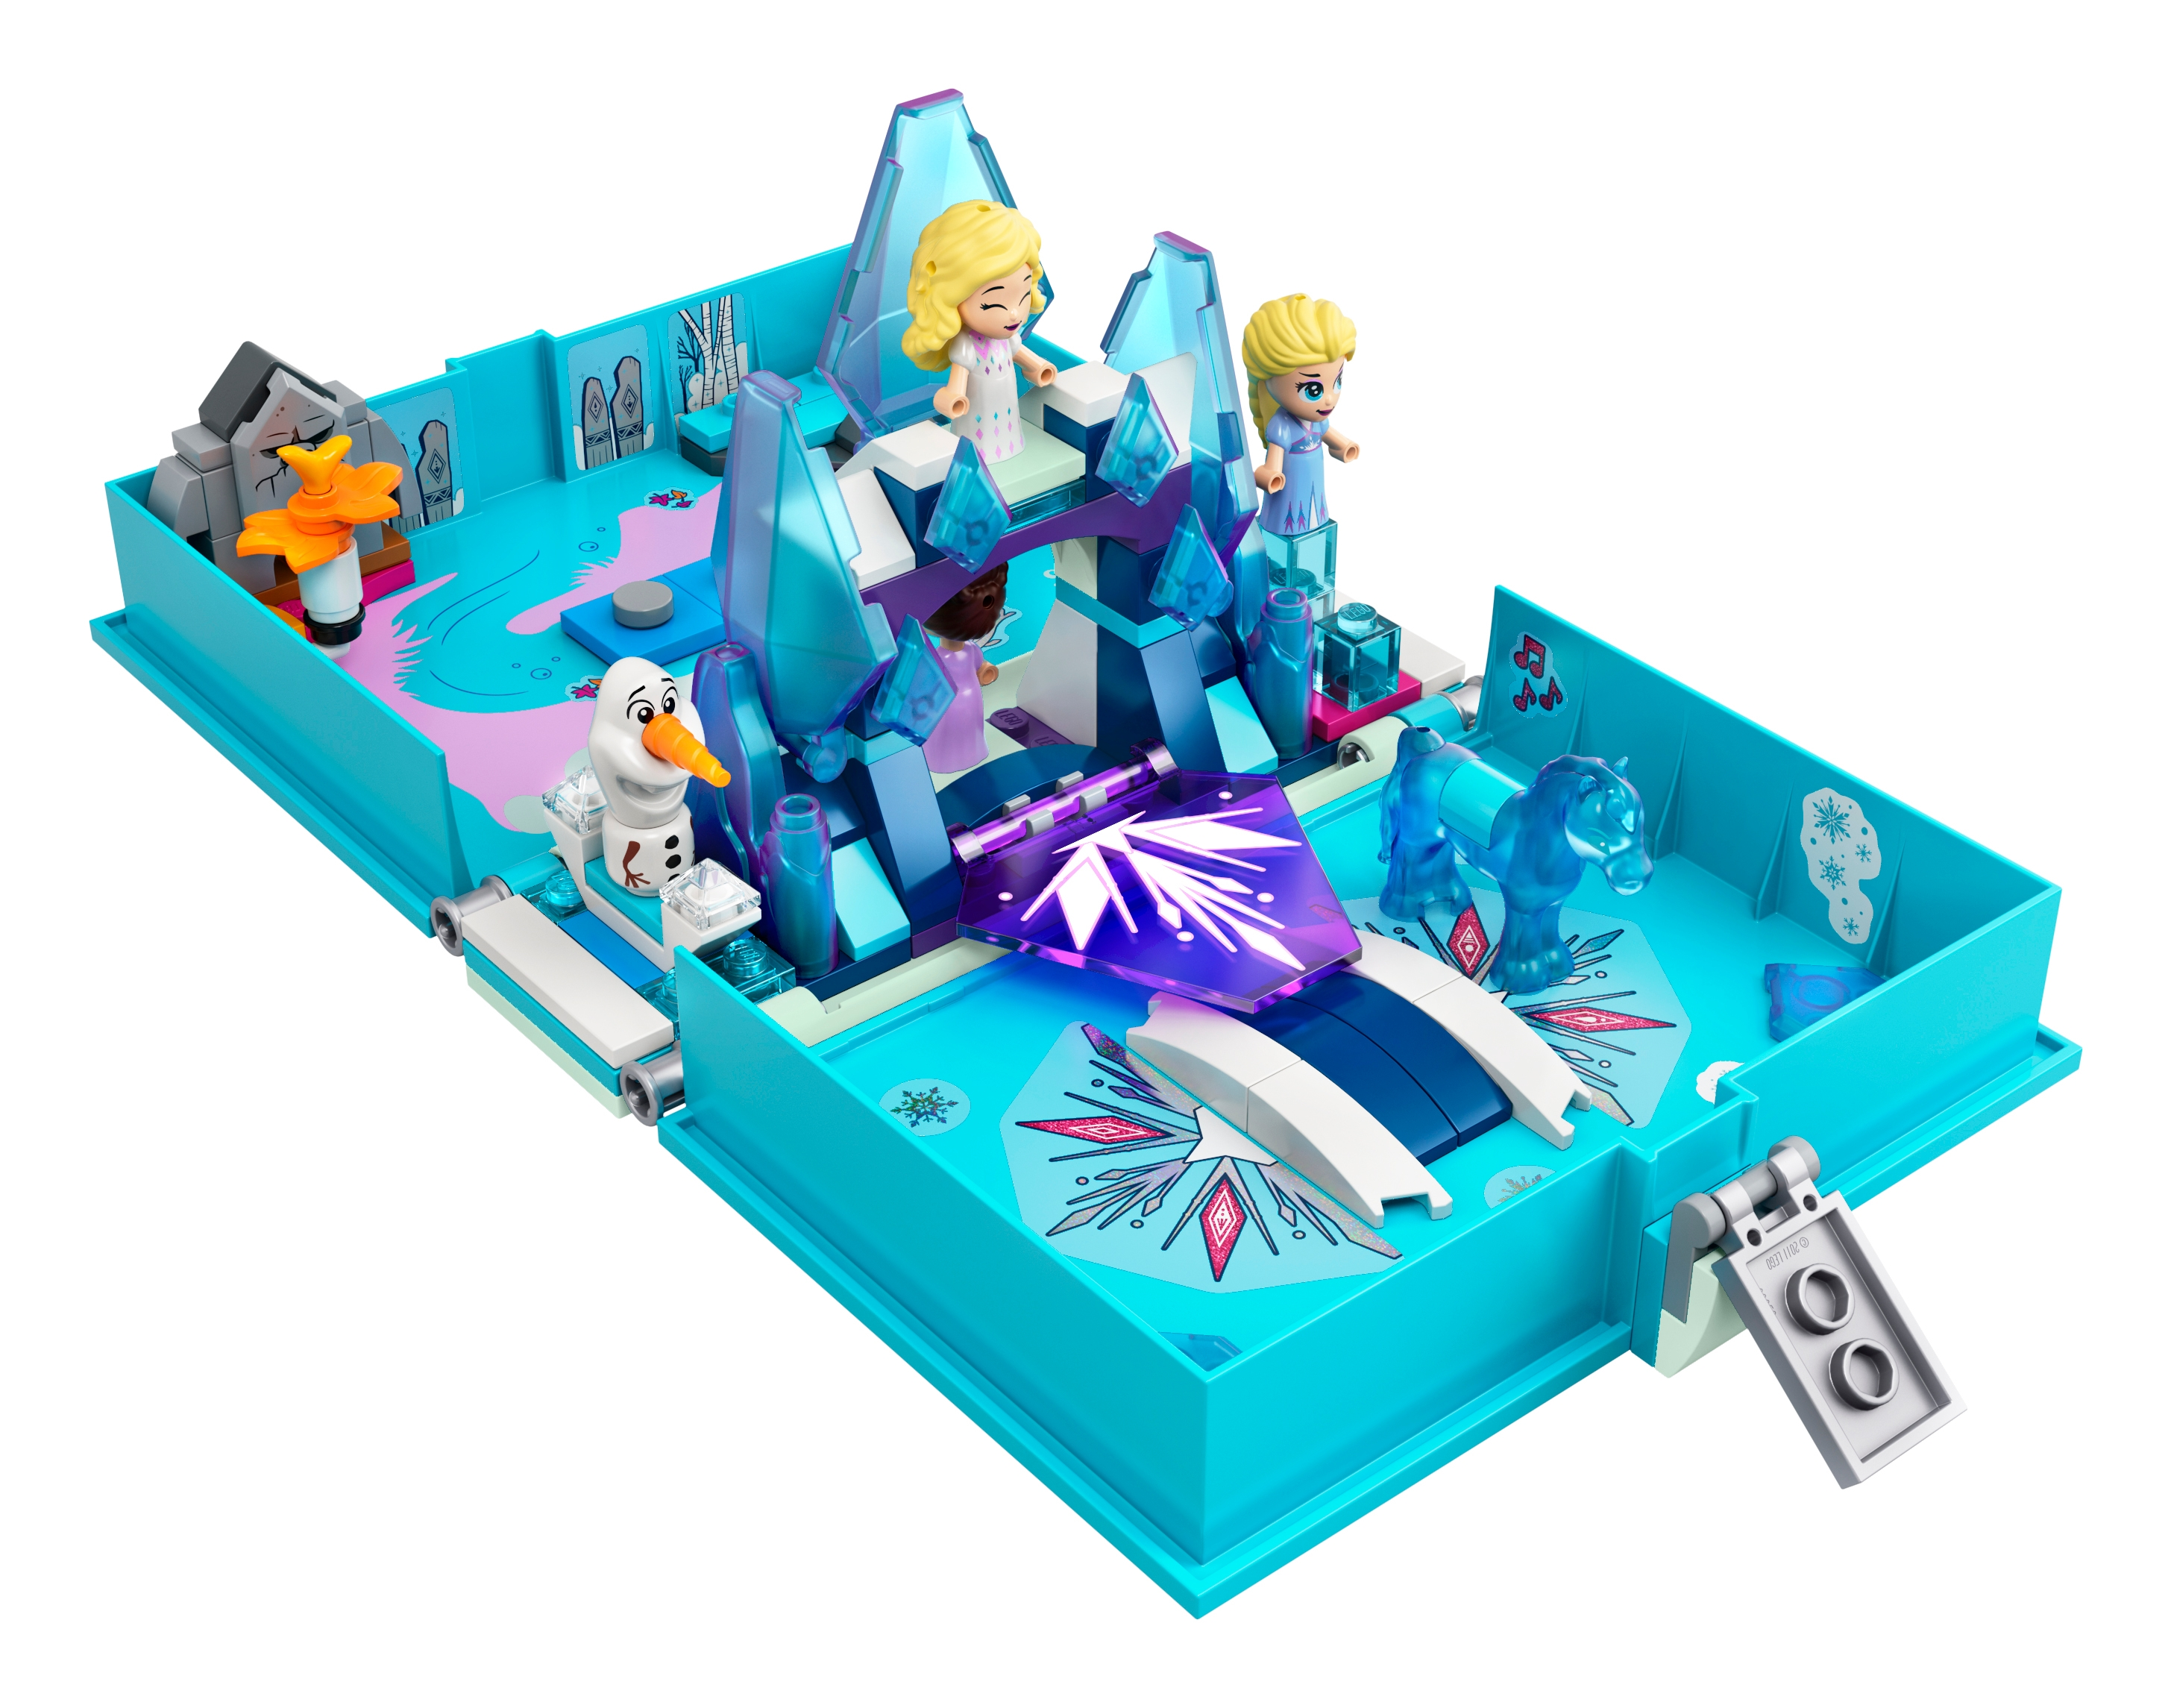 Lego® Schneeflocke x789 Eiskristall transparent blau Snowflake Ice Crystal blue